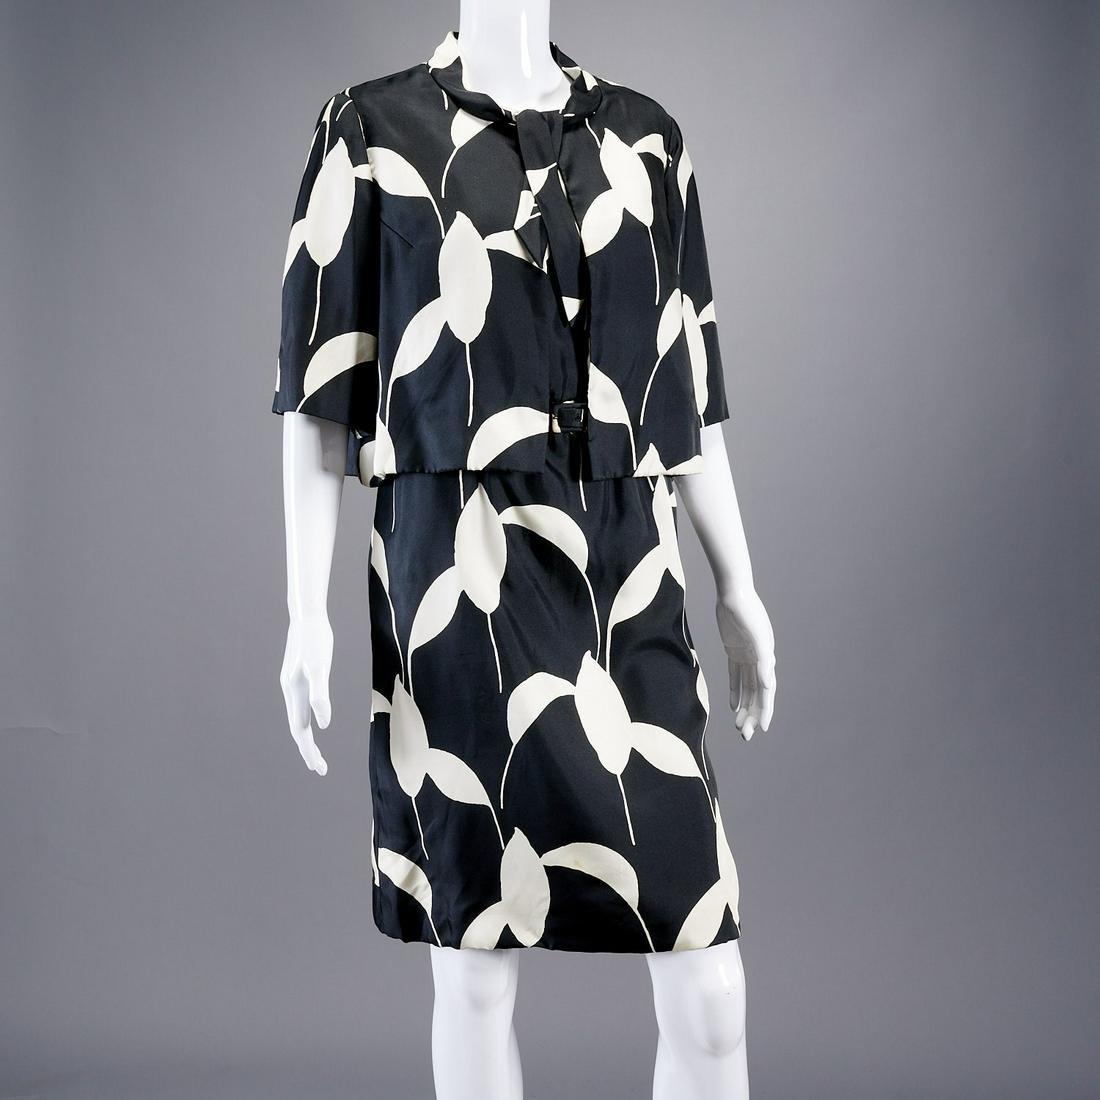 Bill Blass for Maurice Rentner dress ensemble